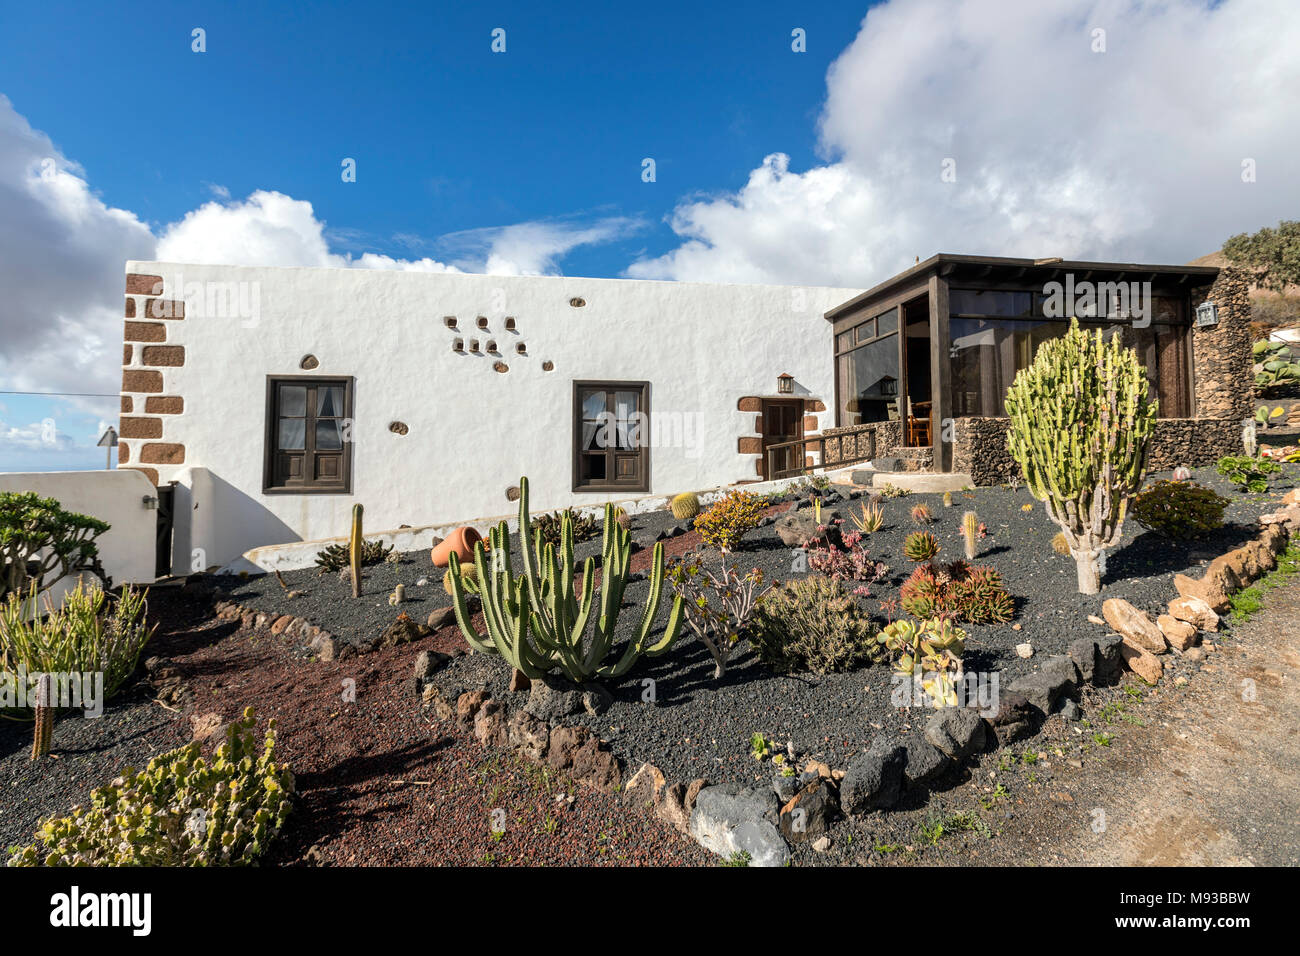 Casa rural spain stock photos casa rural spain stock for Casa rural mansion terraplen seis